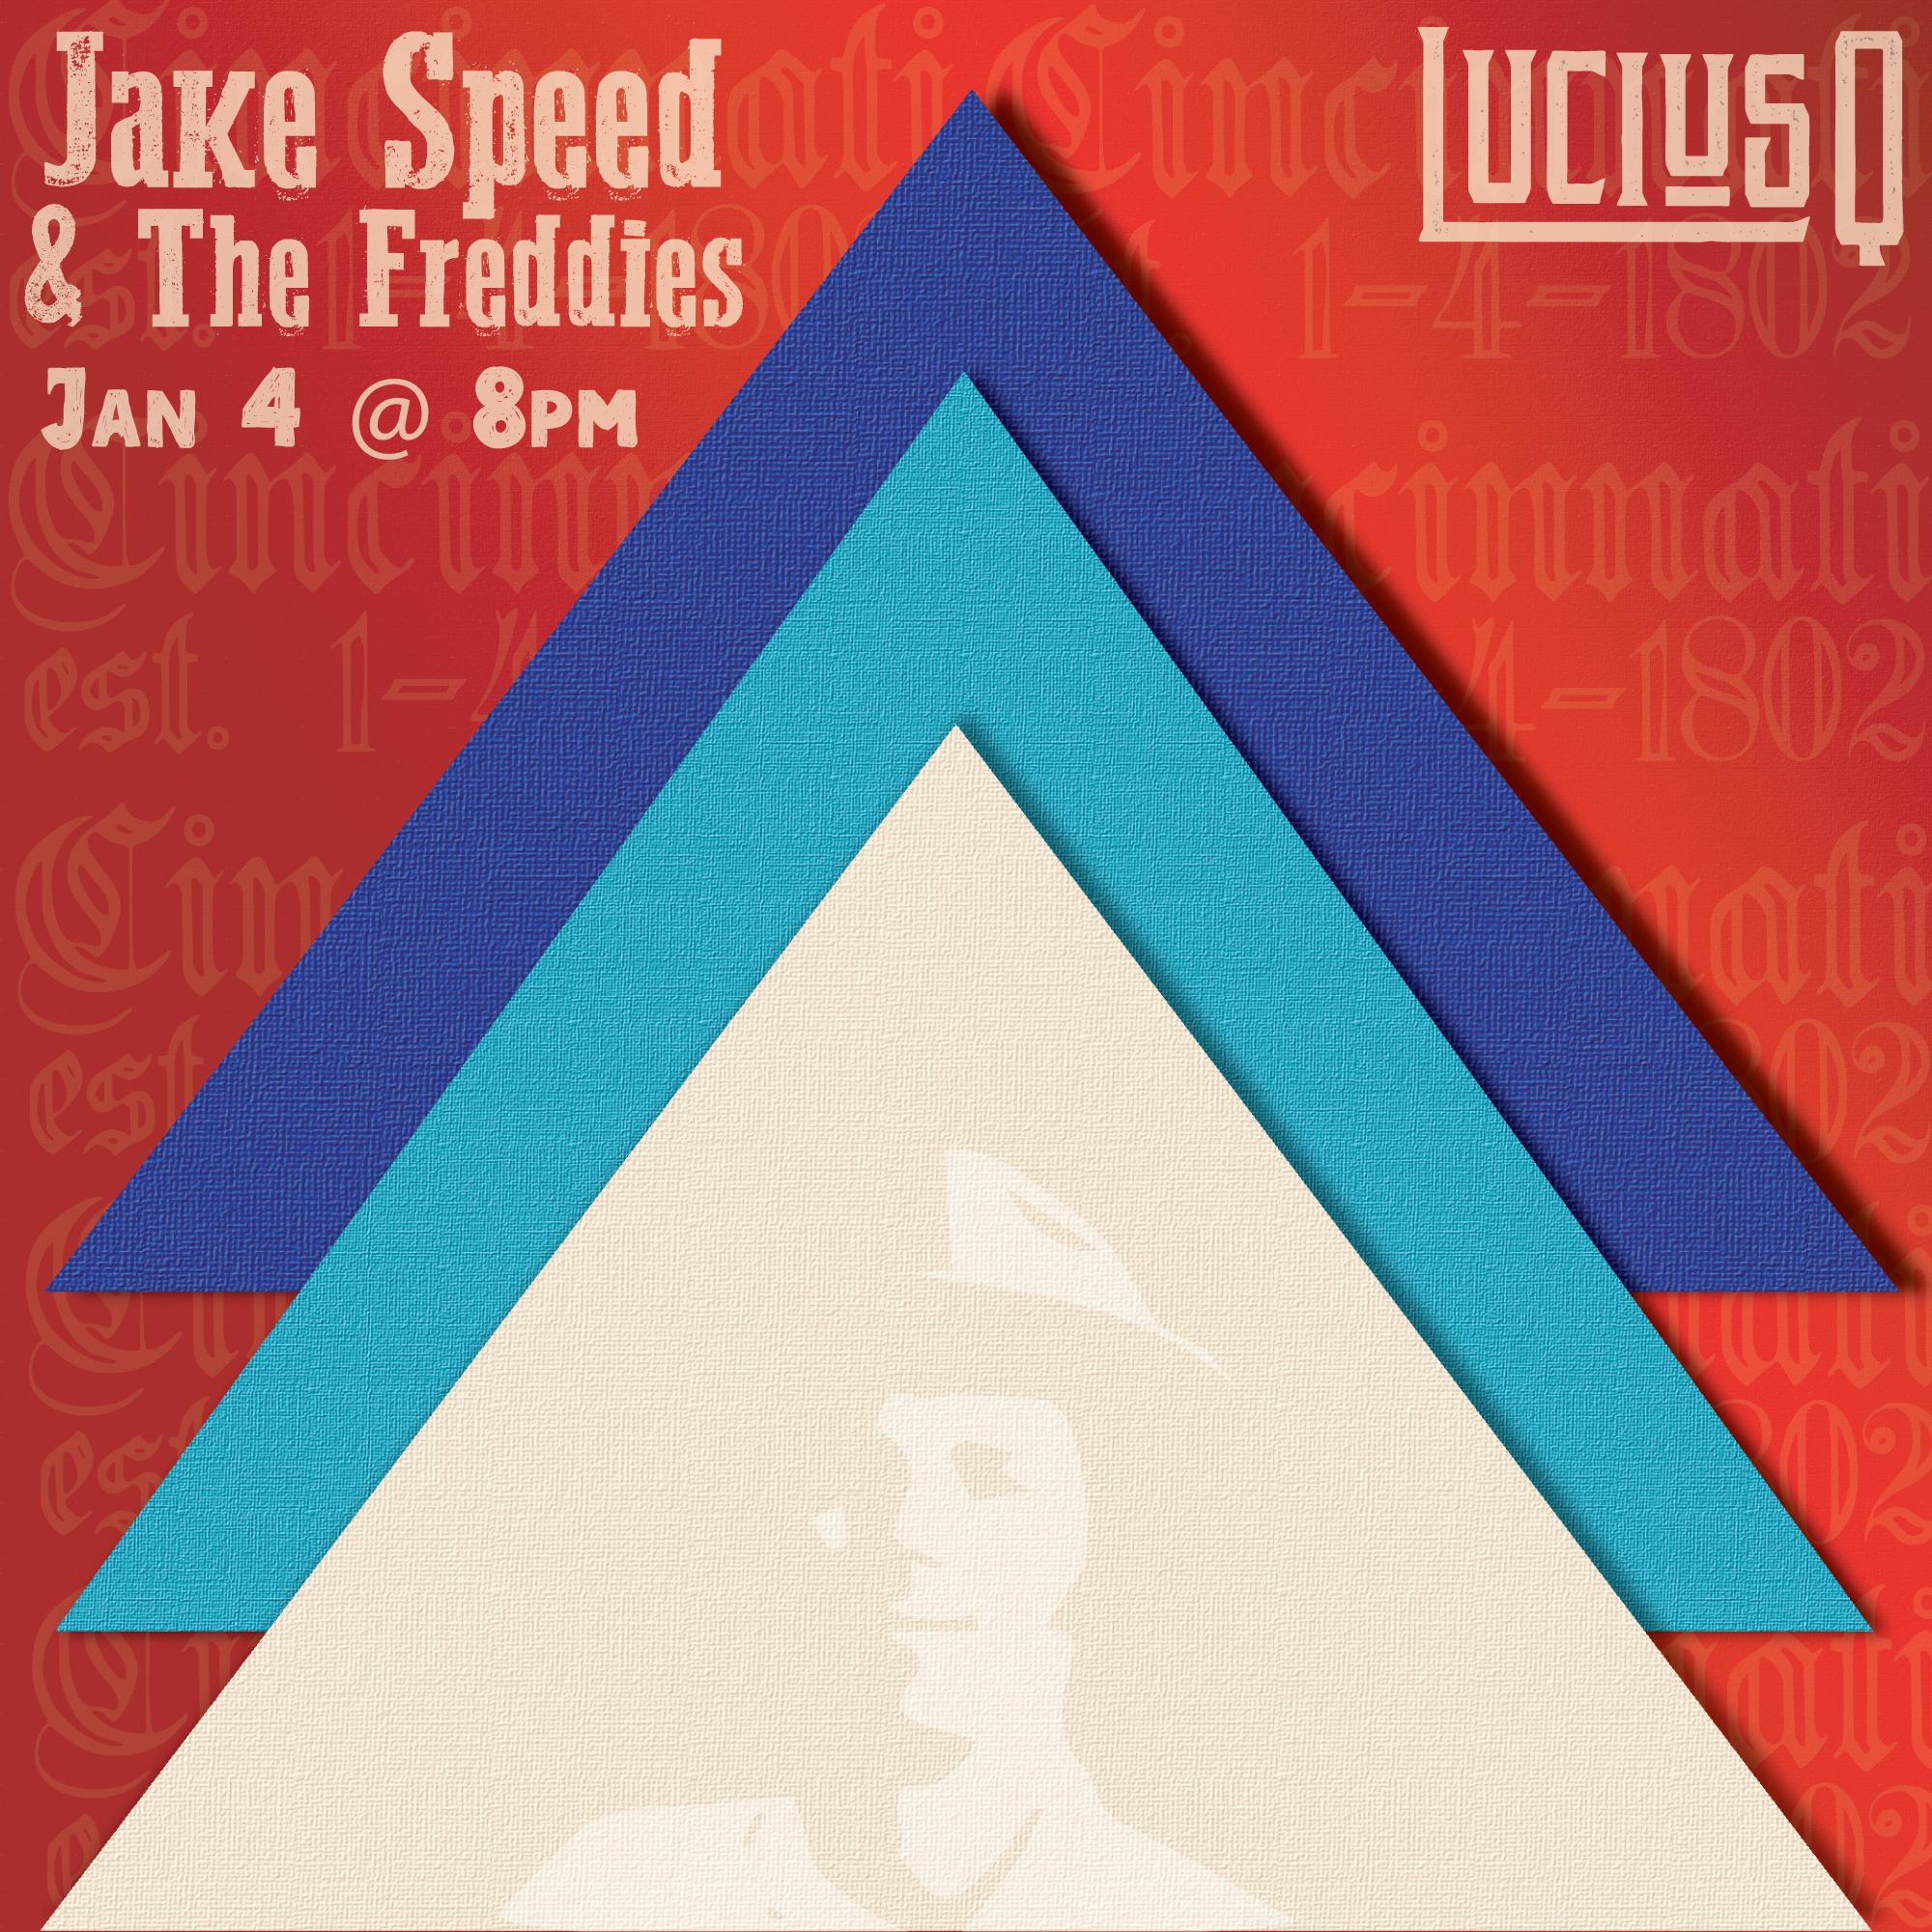 Lucius-Jake-Speed.png